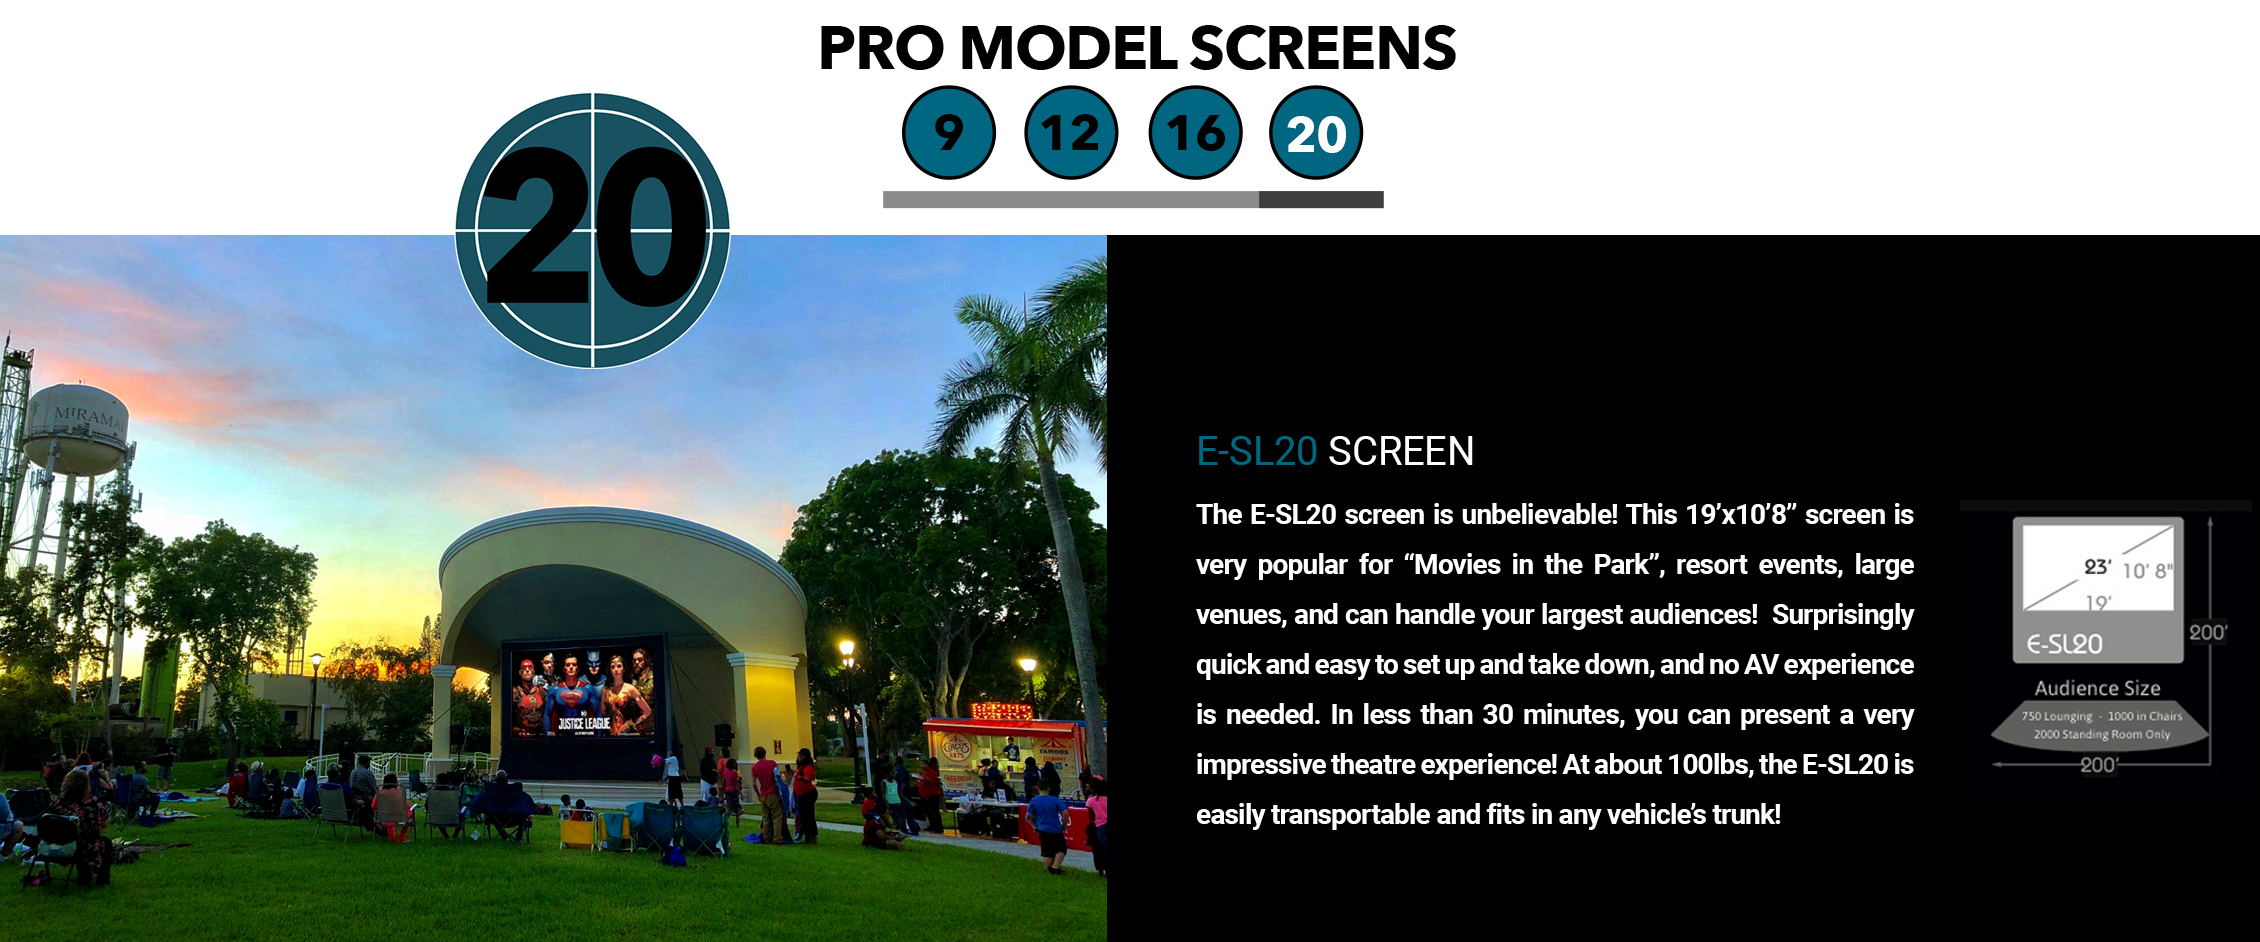 PRO MODEL SCREENS 9.jpg